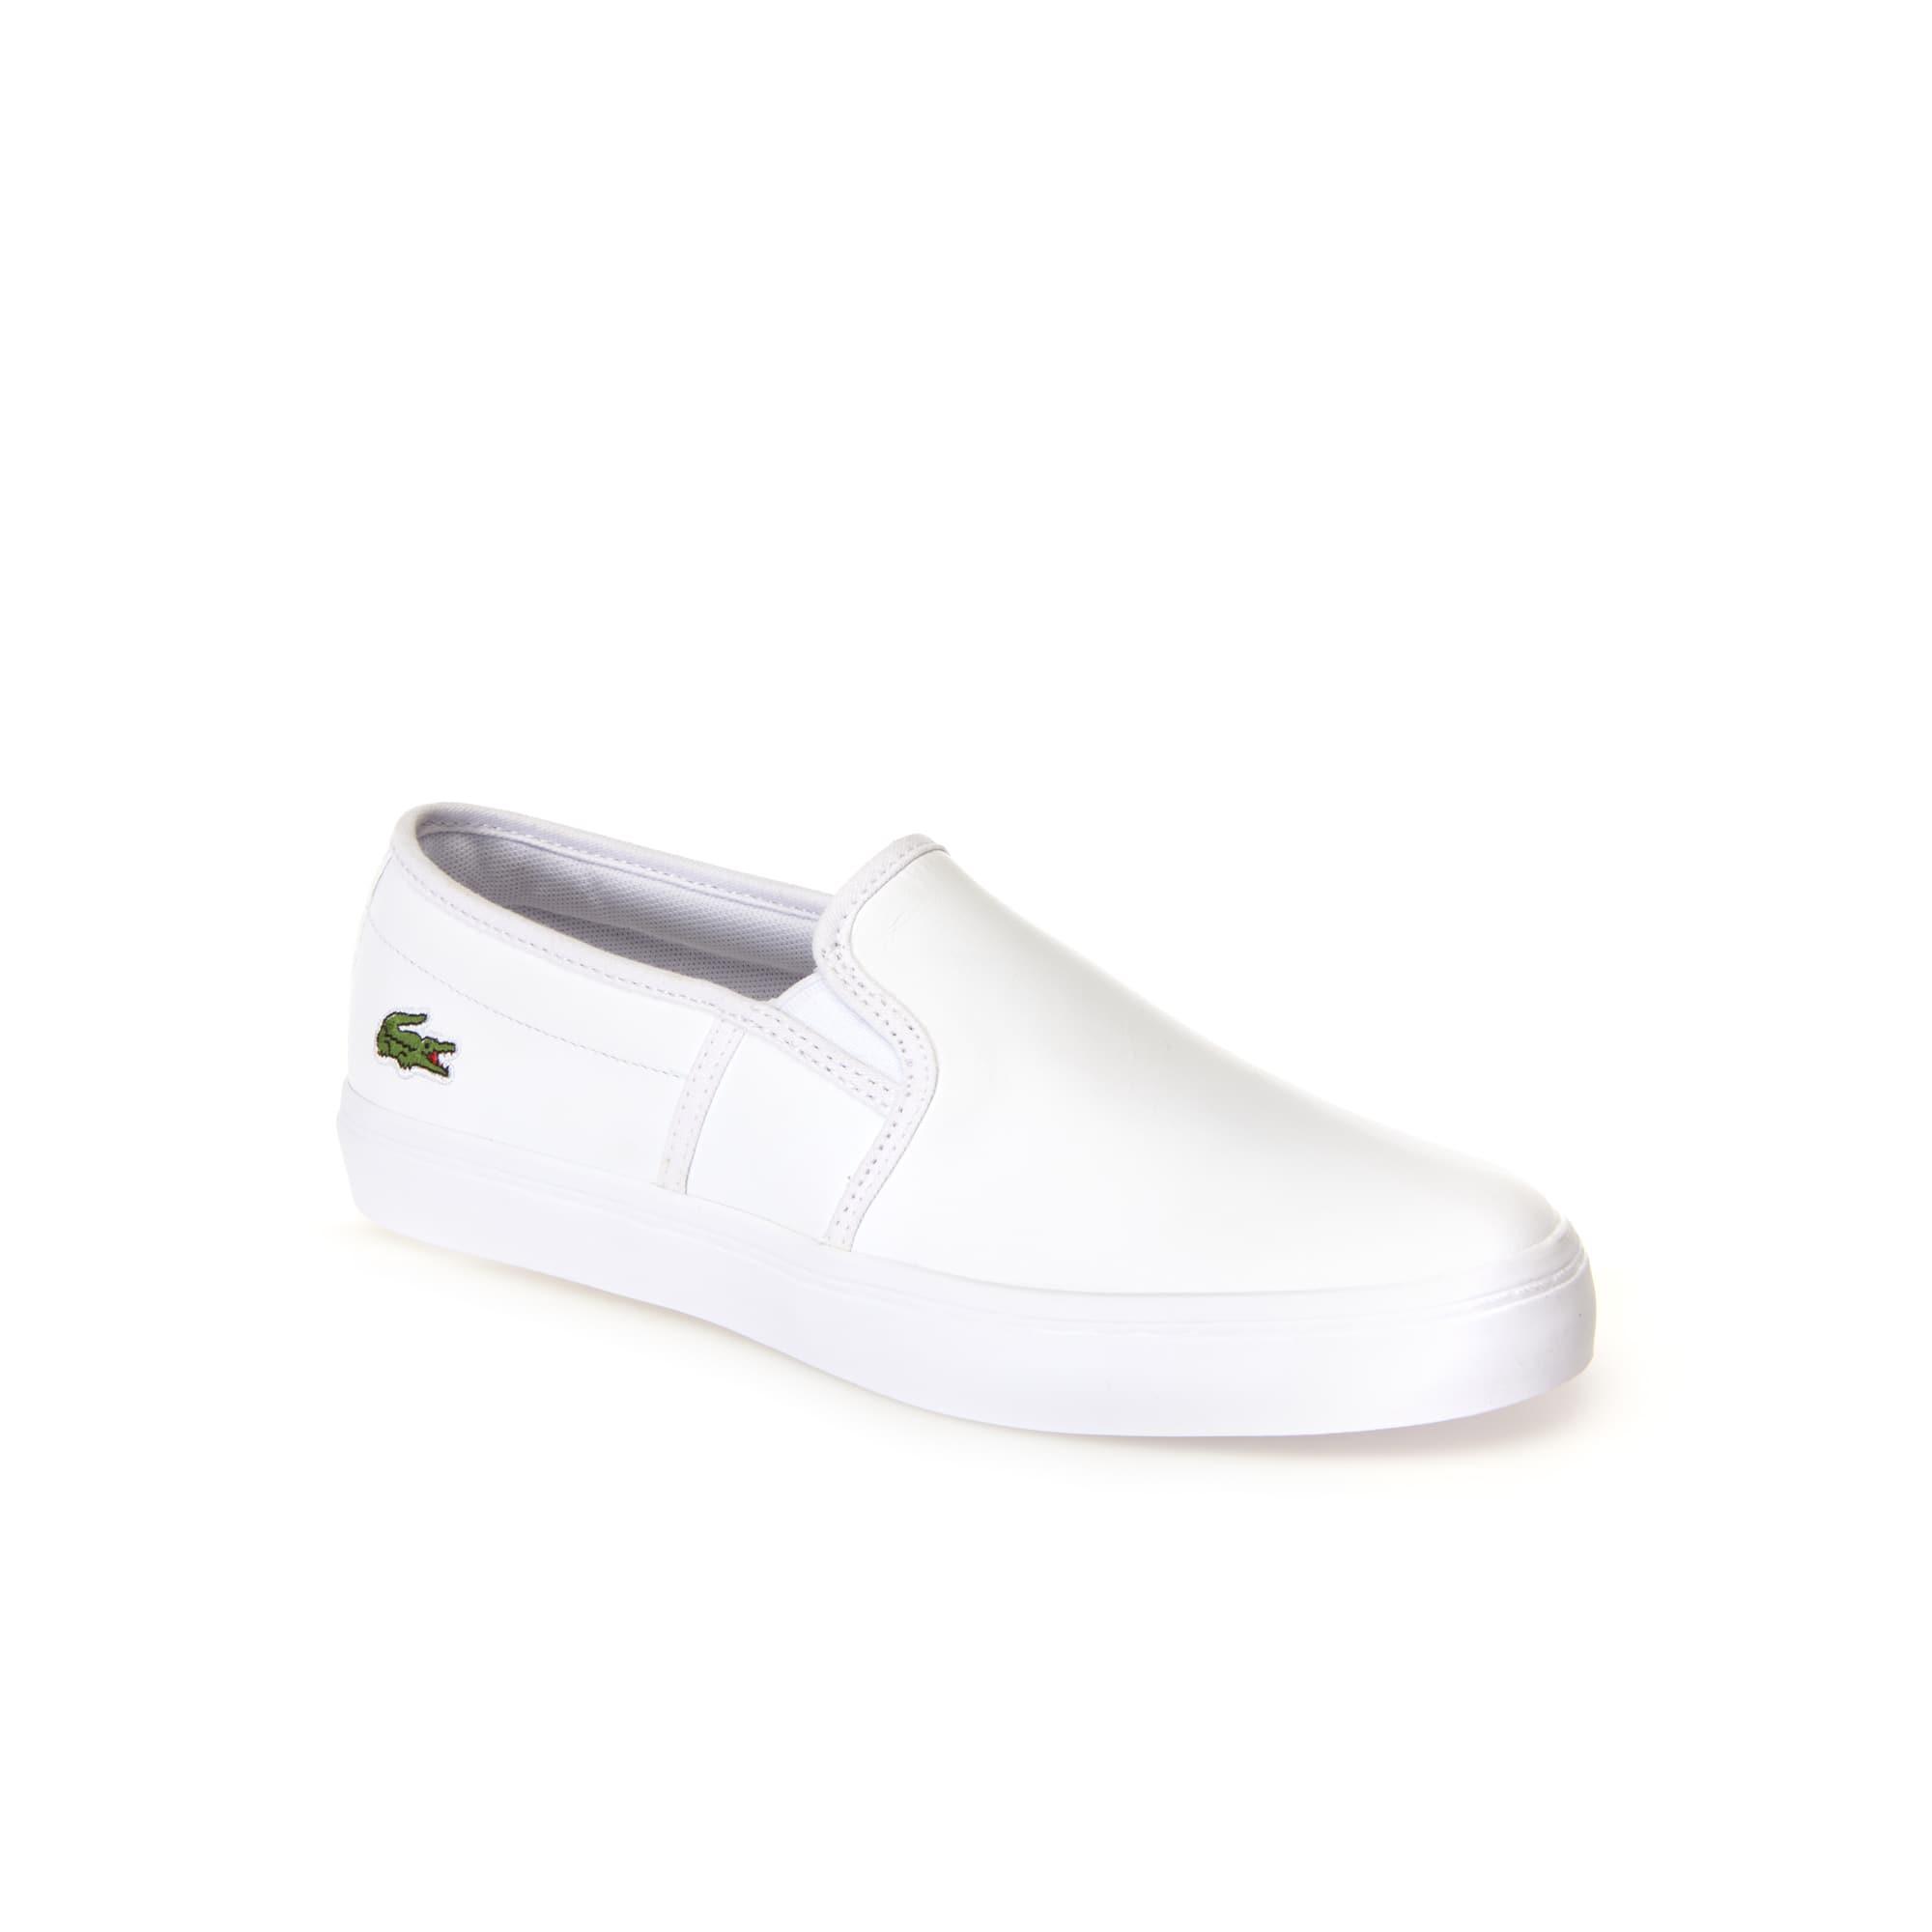 Sneakers senza stringhe Gazon in pelle